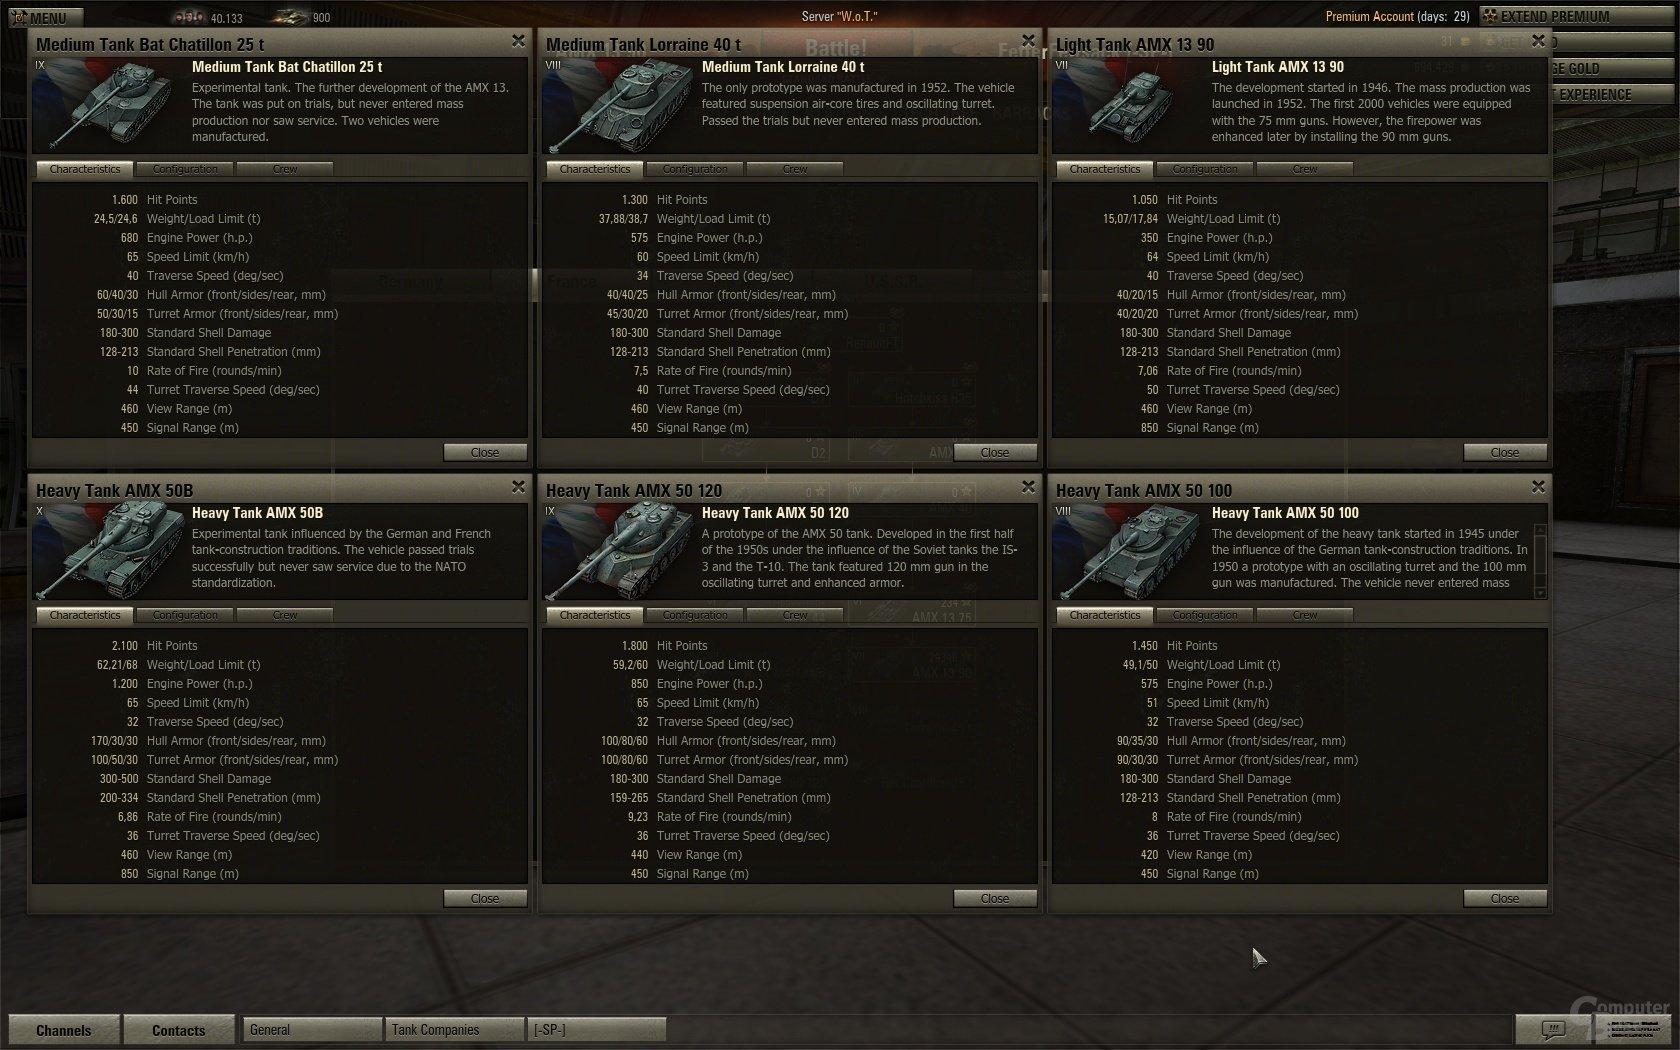 Hightier-Panzer-Daten